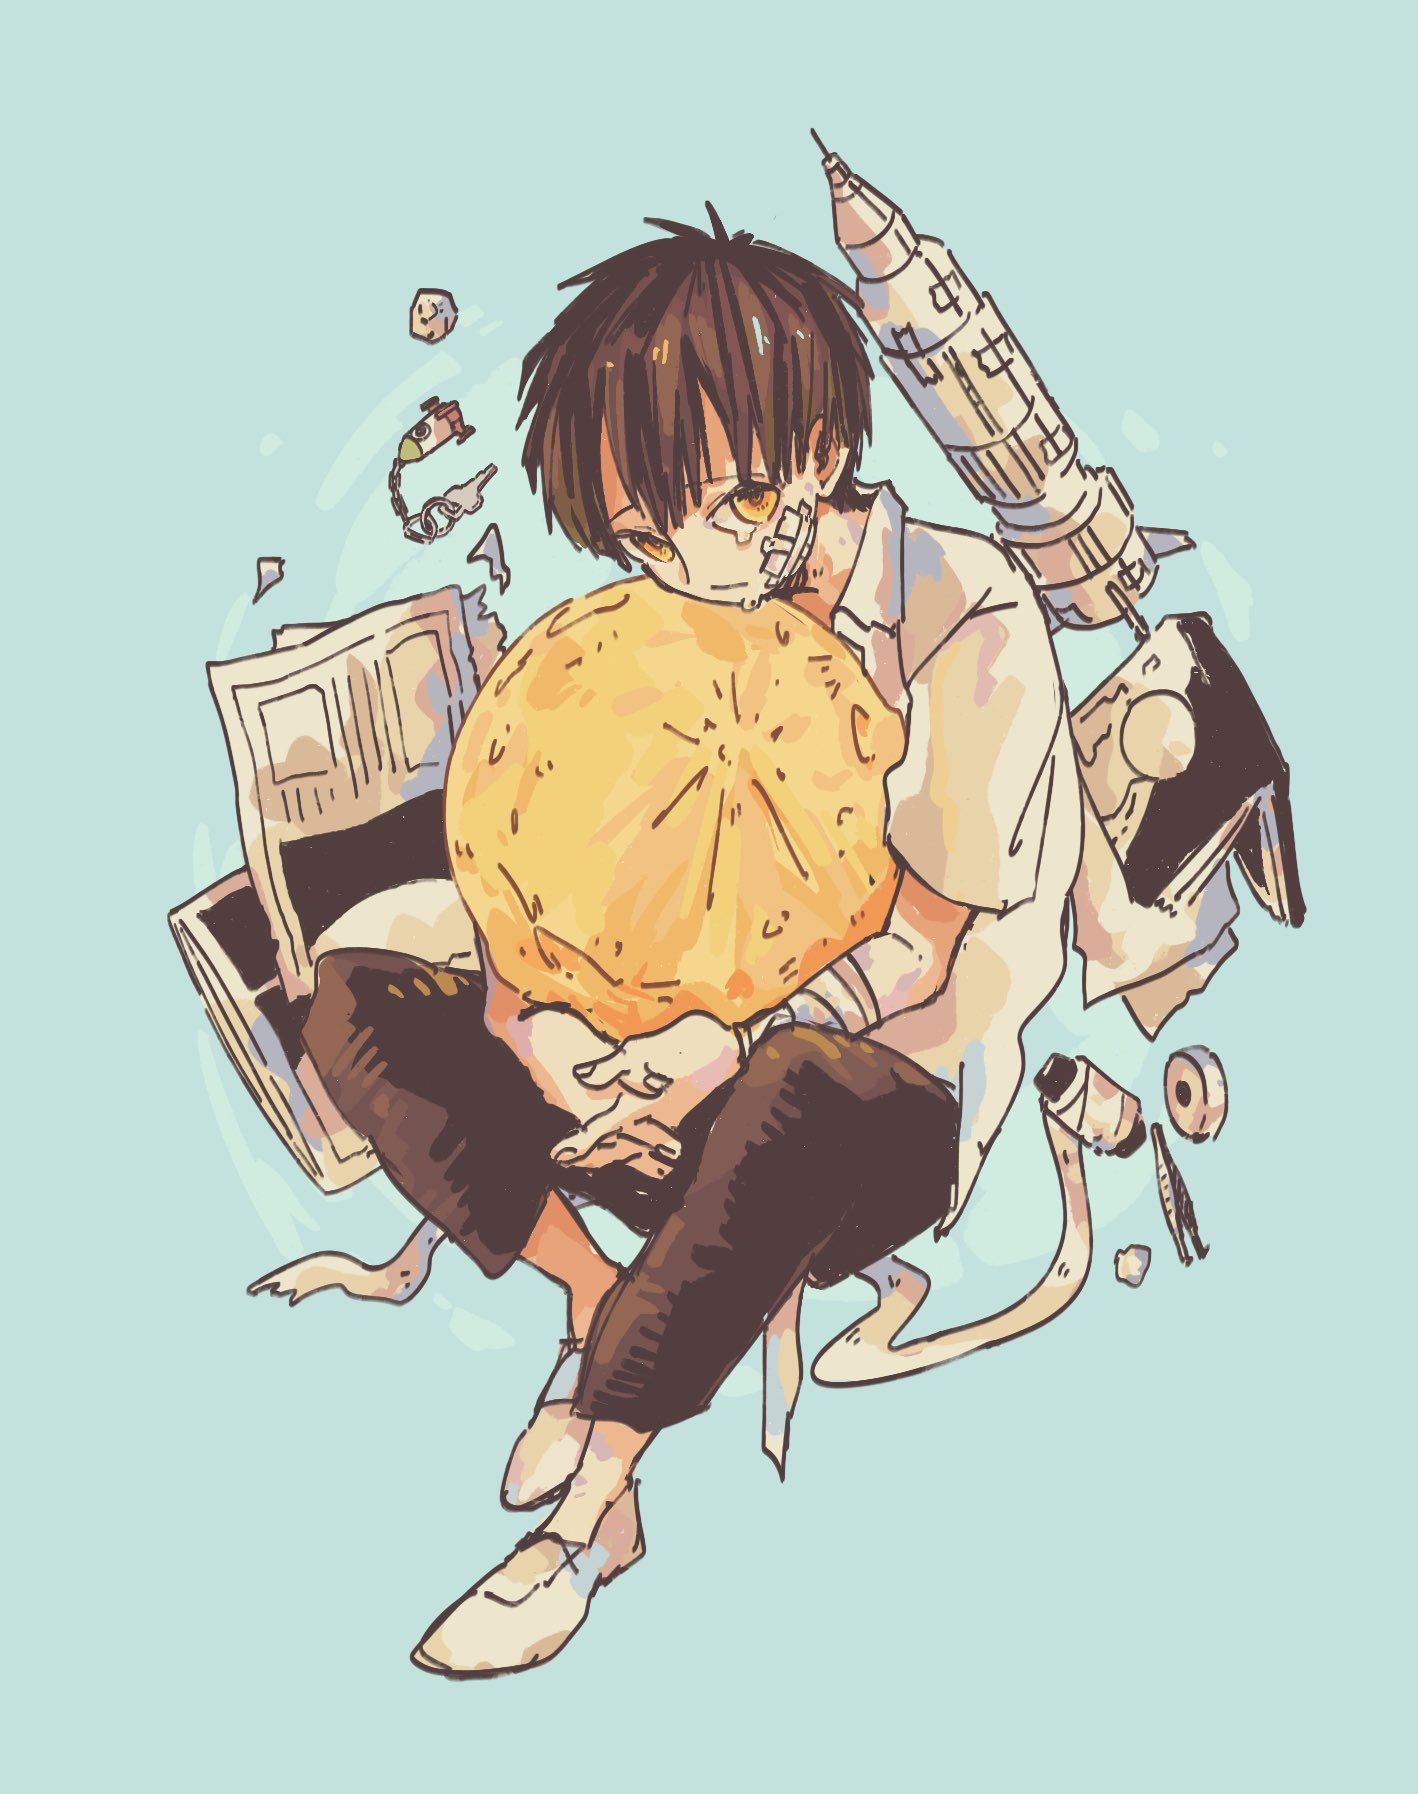 Pin by Lillian Ingle on Hanako in 2020 Anime, Anime art